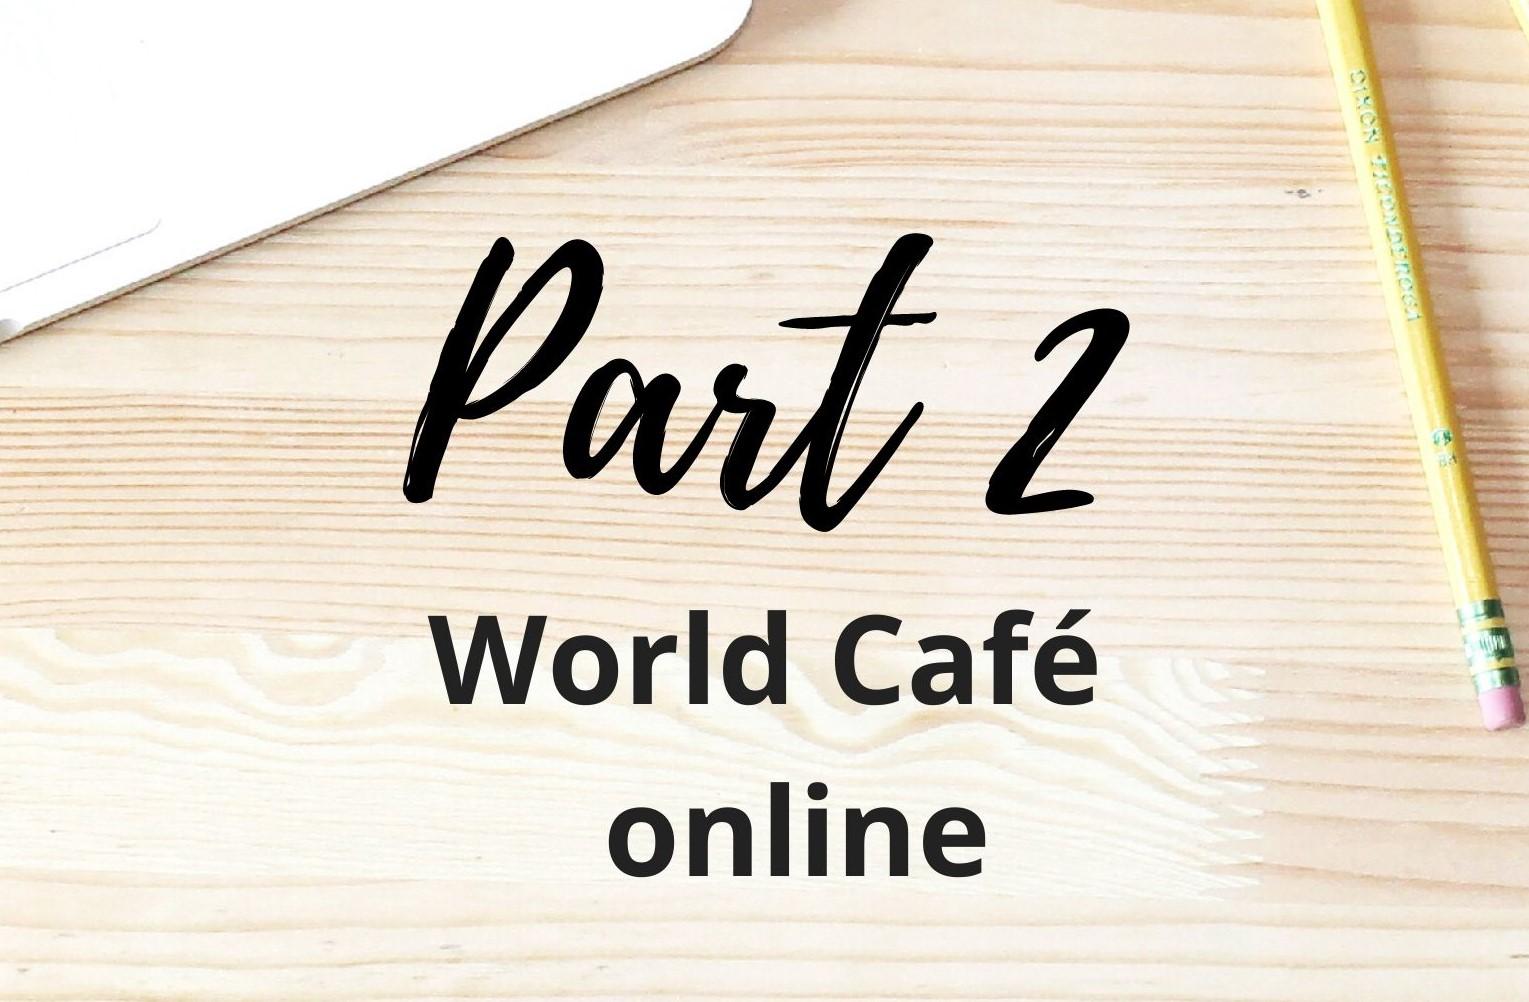 World Café Online Teil 2